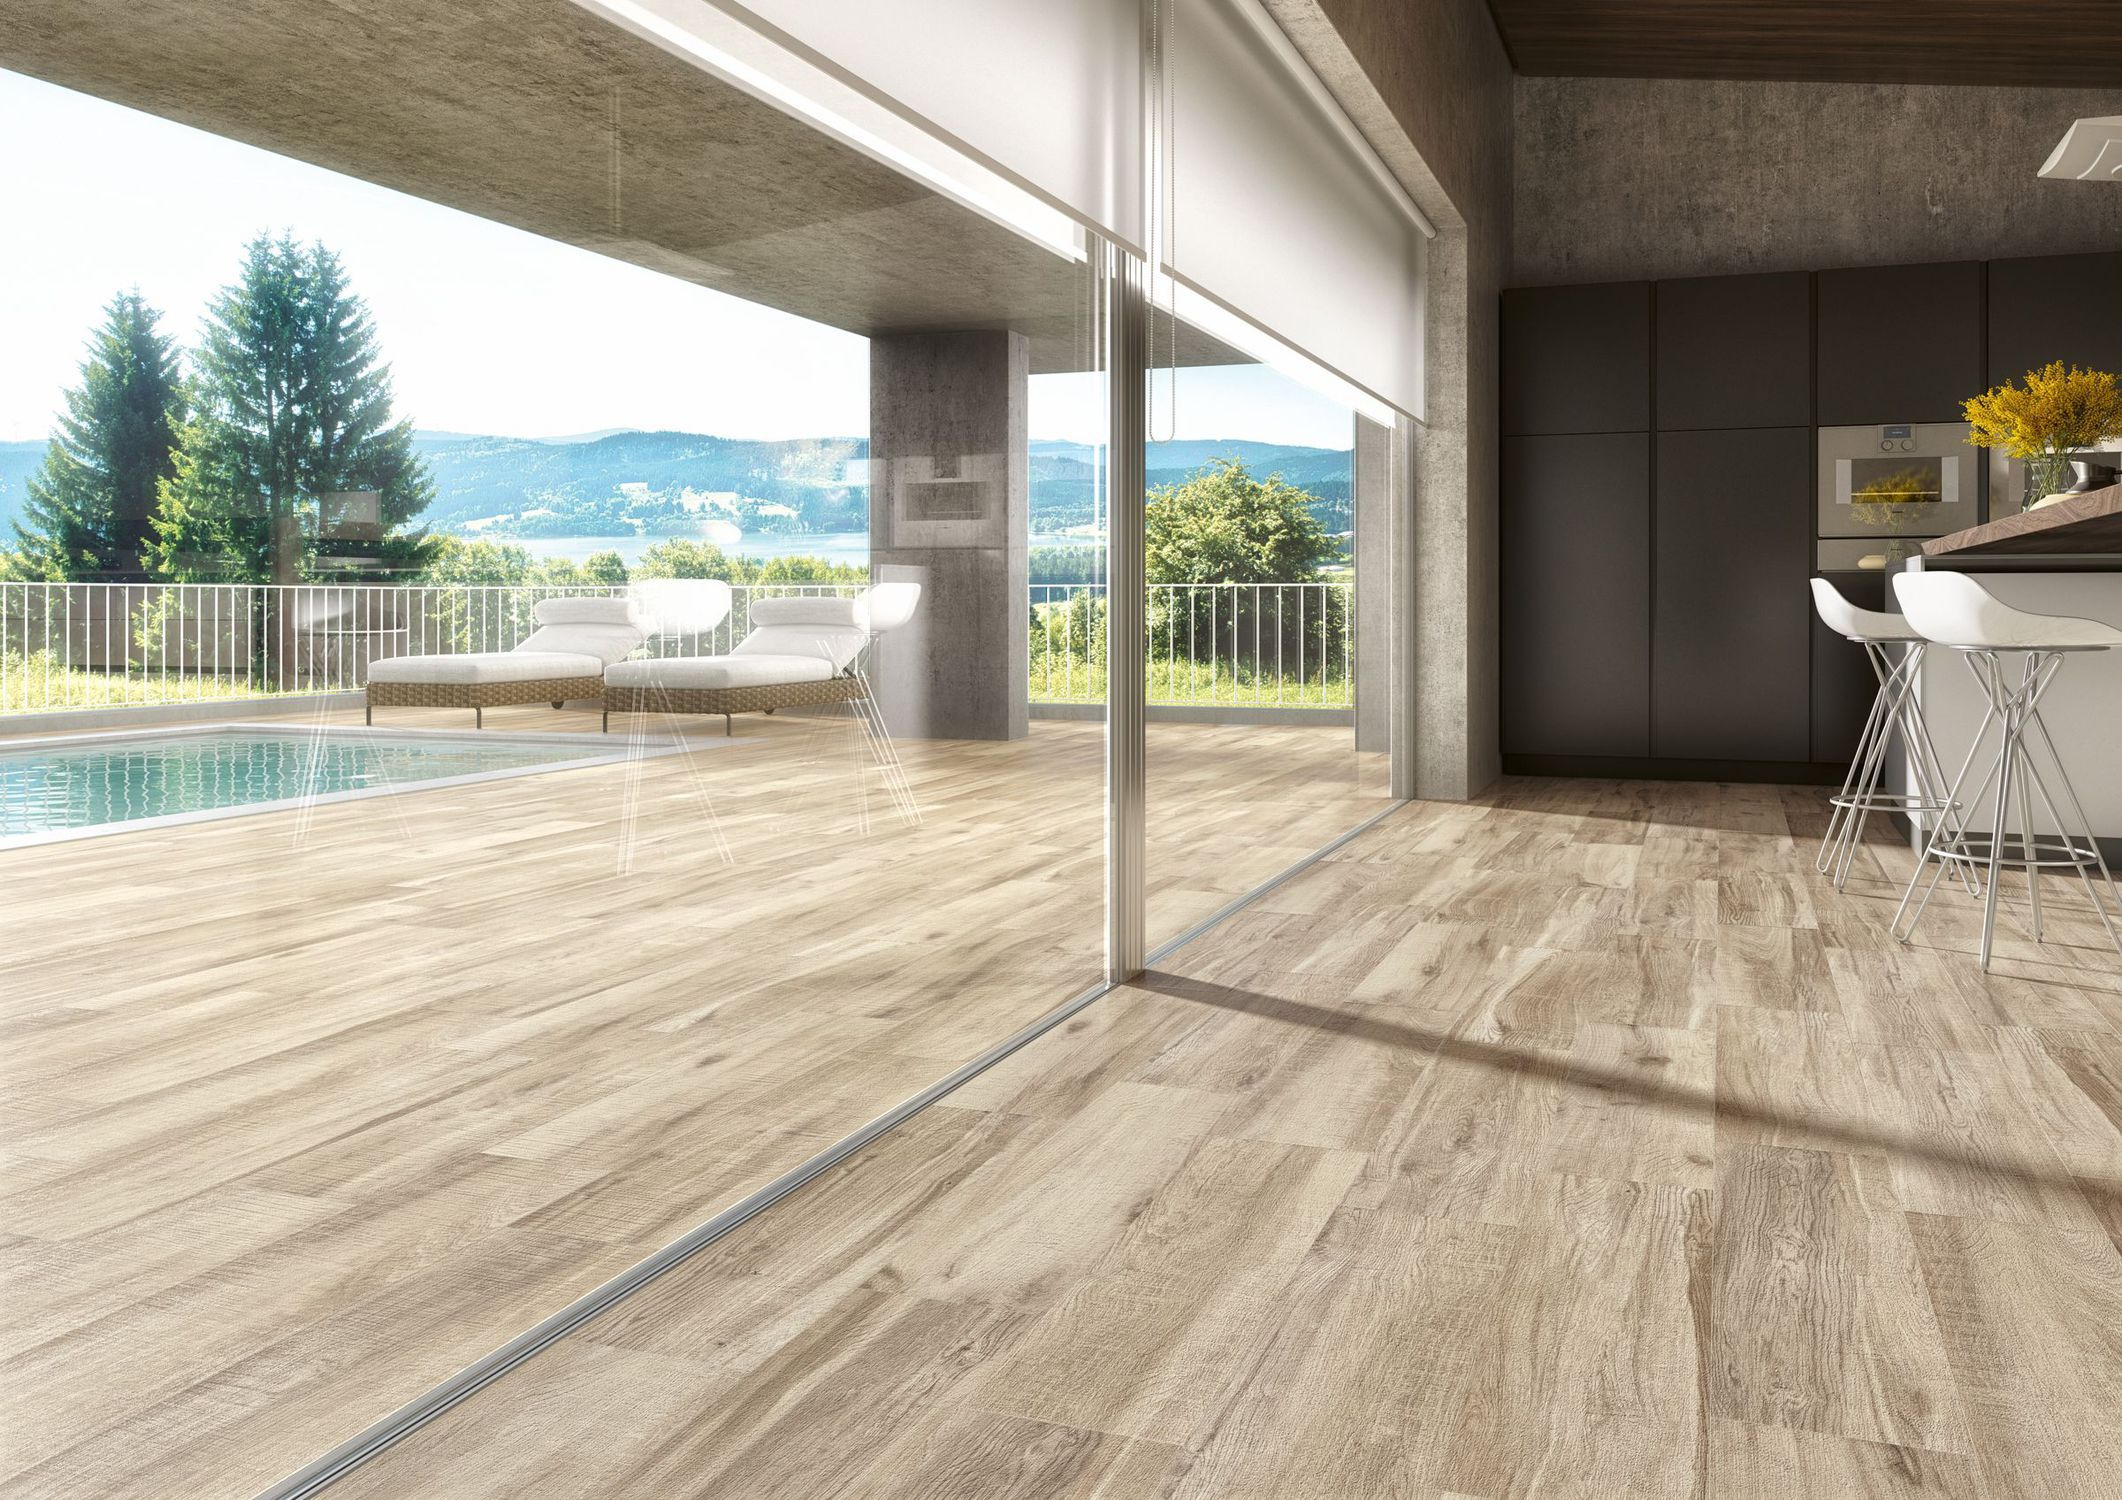 Carrelage Imitation Parquet 30X60 indoor tile / outdoor / wall / floor - coolwood - pavigres